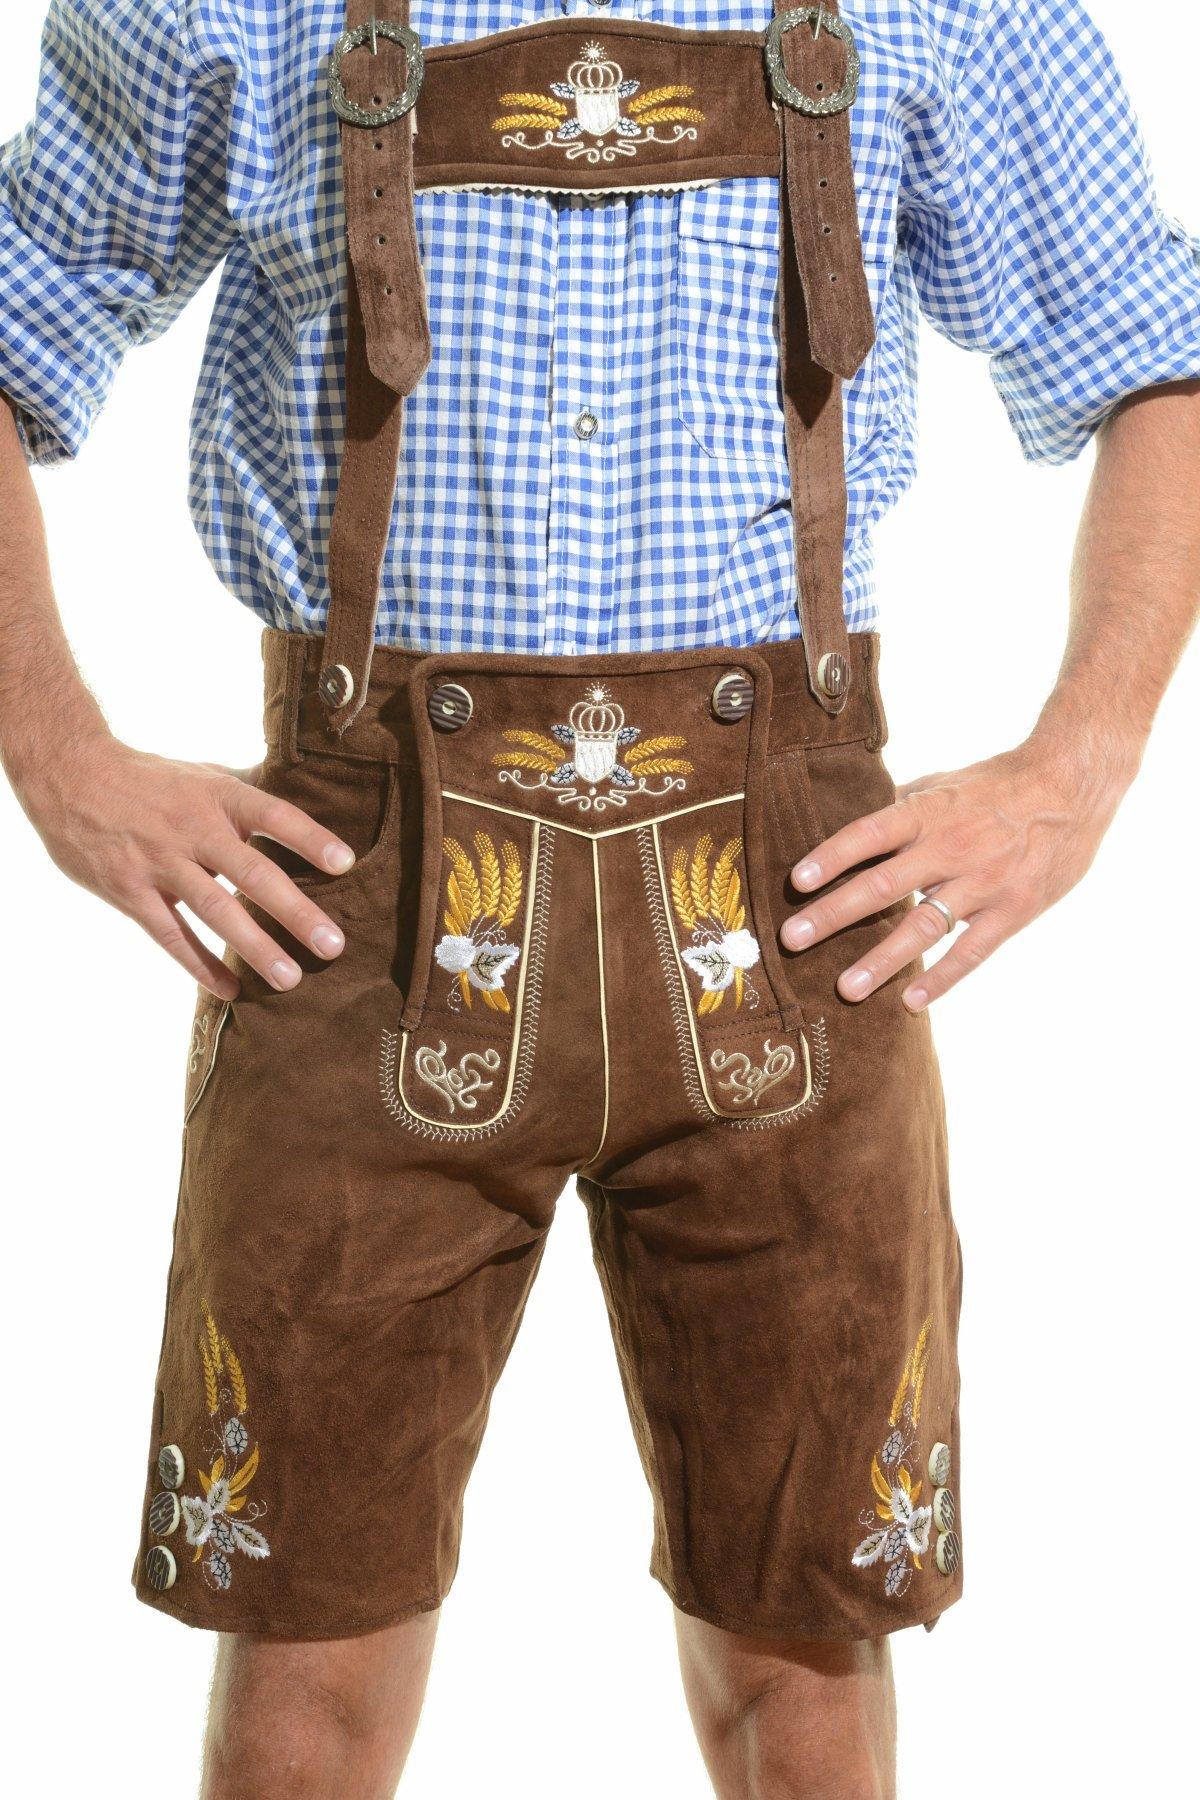 OKTOBERFEST Men's Bavarian Lederhosen Brown - Oktoberfest Leather Trousers 34